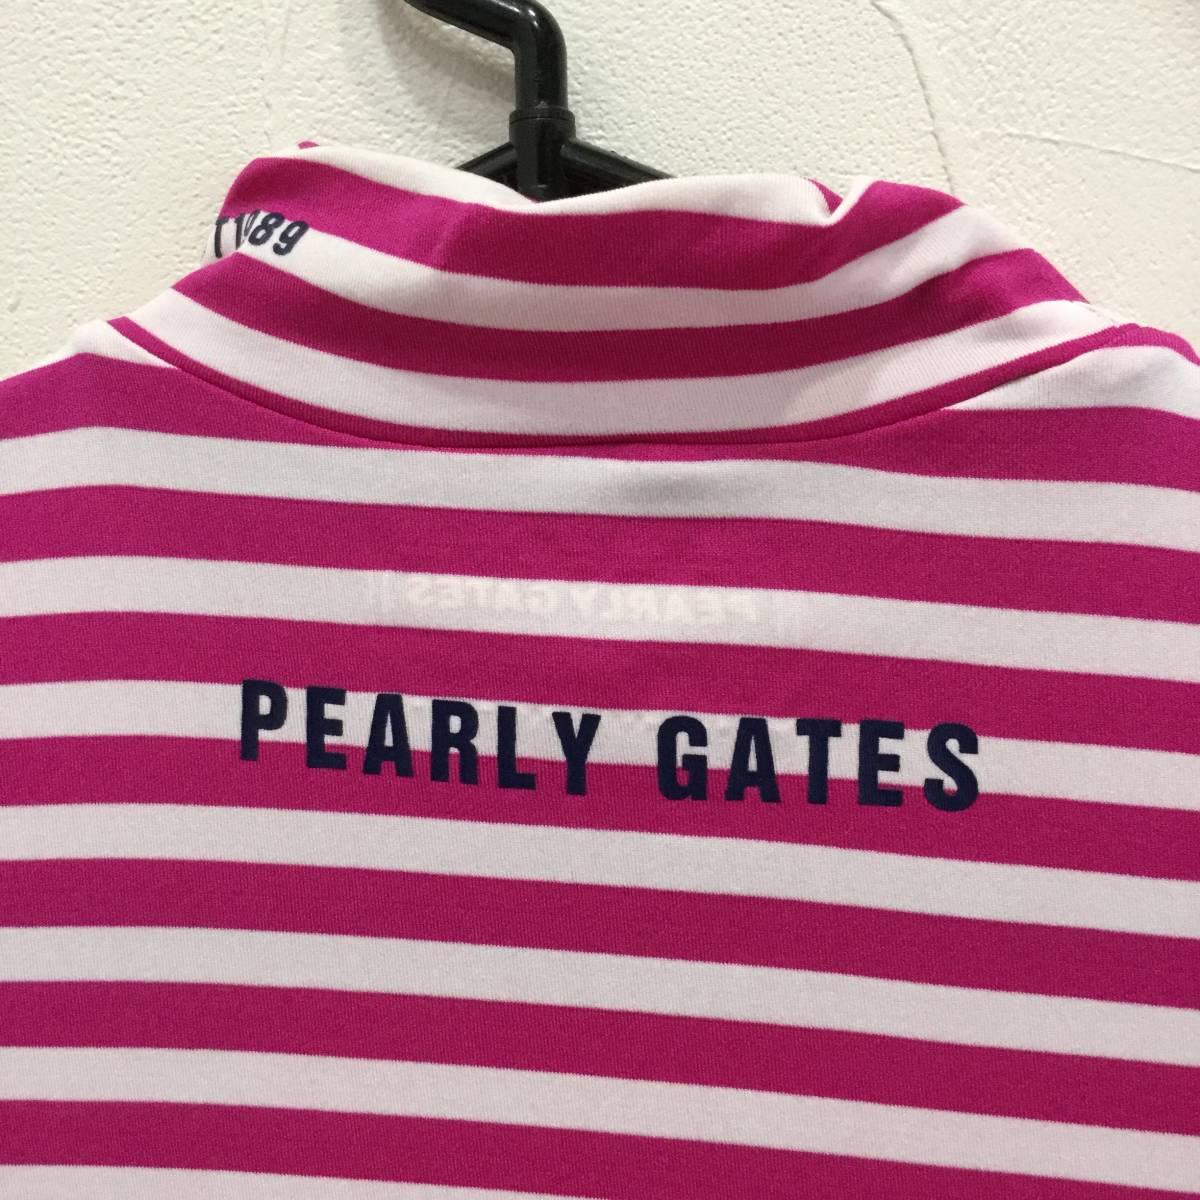 PEARLY GATES パーリーゲイツ ハイネックインナーシャツ サイズ2 *白×ピンク* ロゴ インナーシャツ レディース ゴルフウェア 長袖_画像4